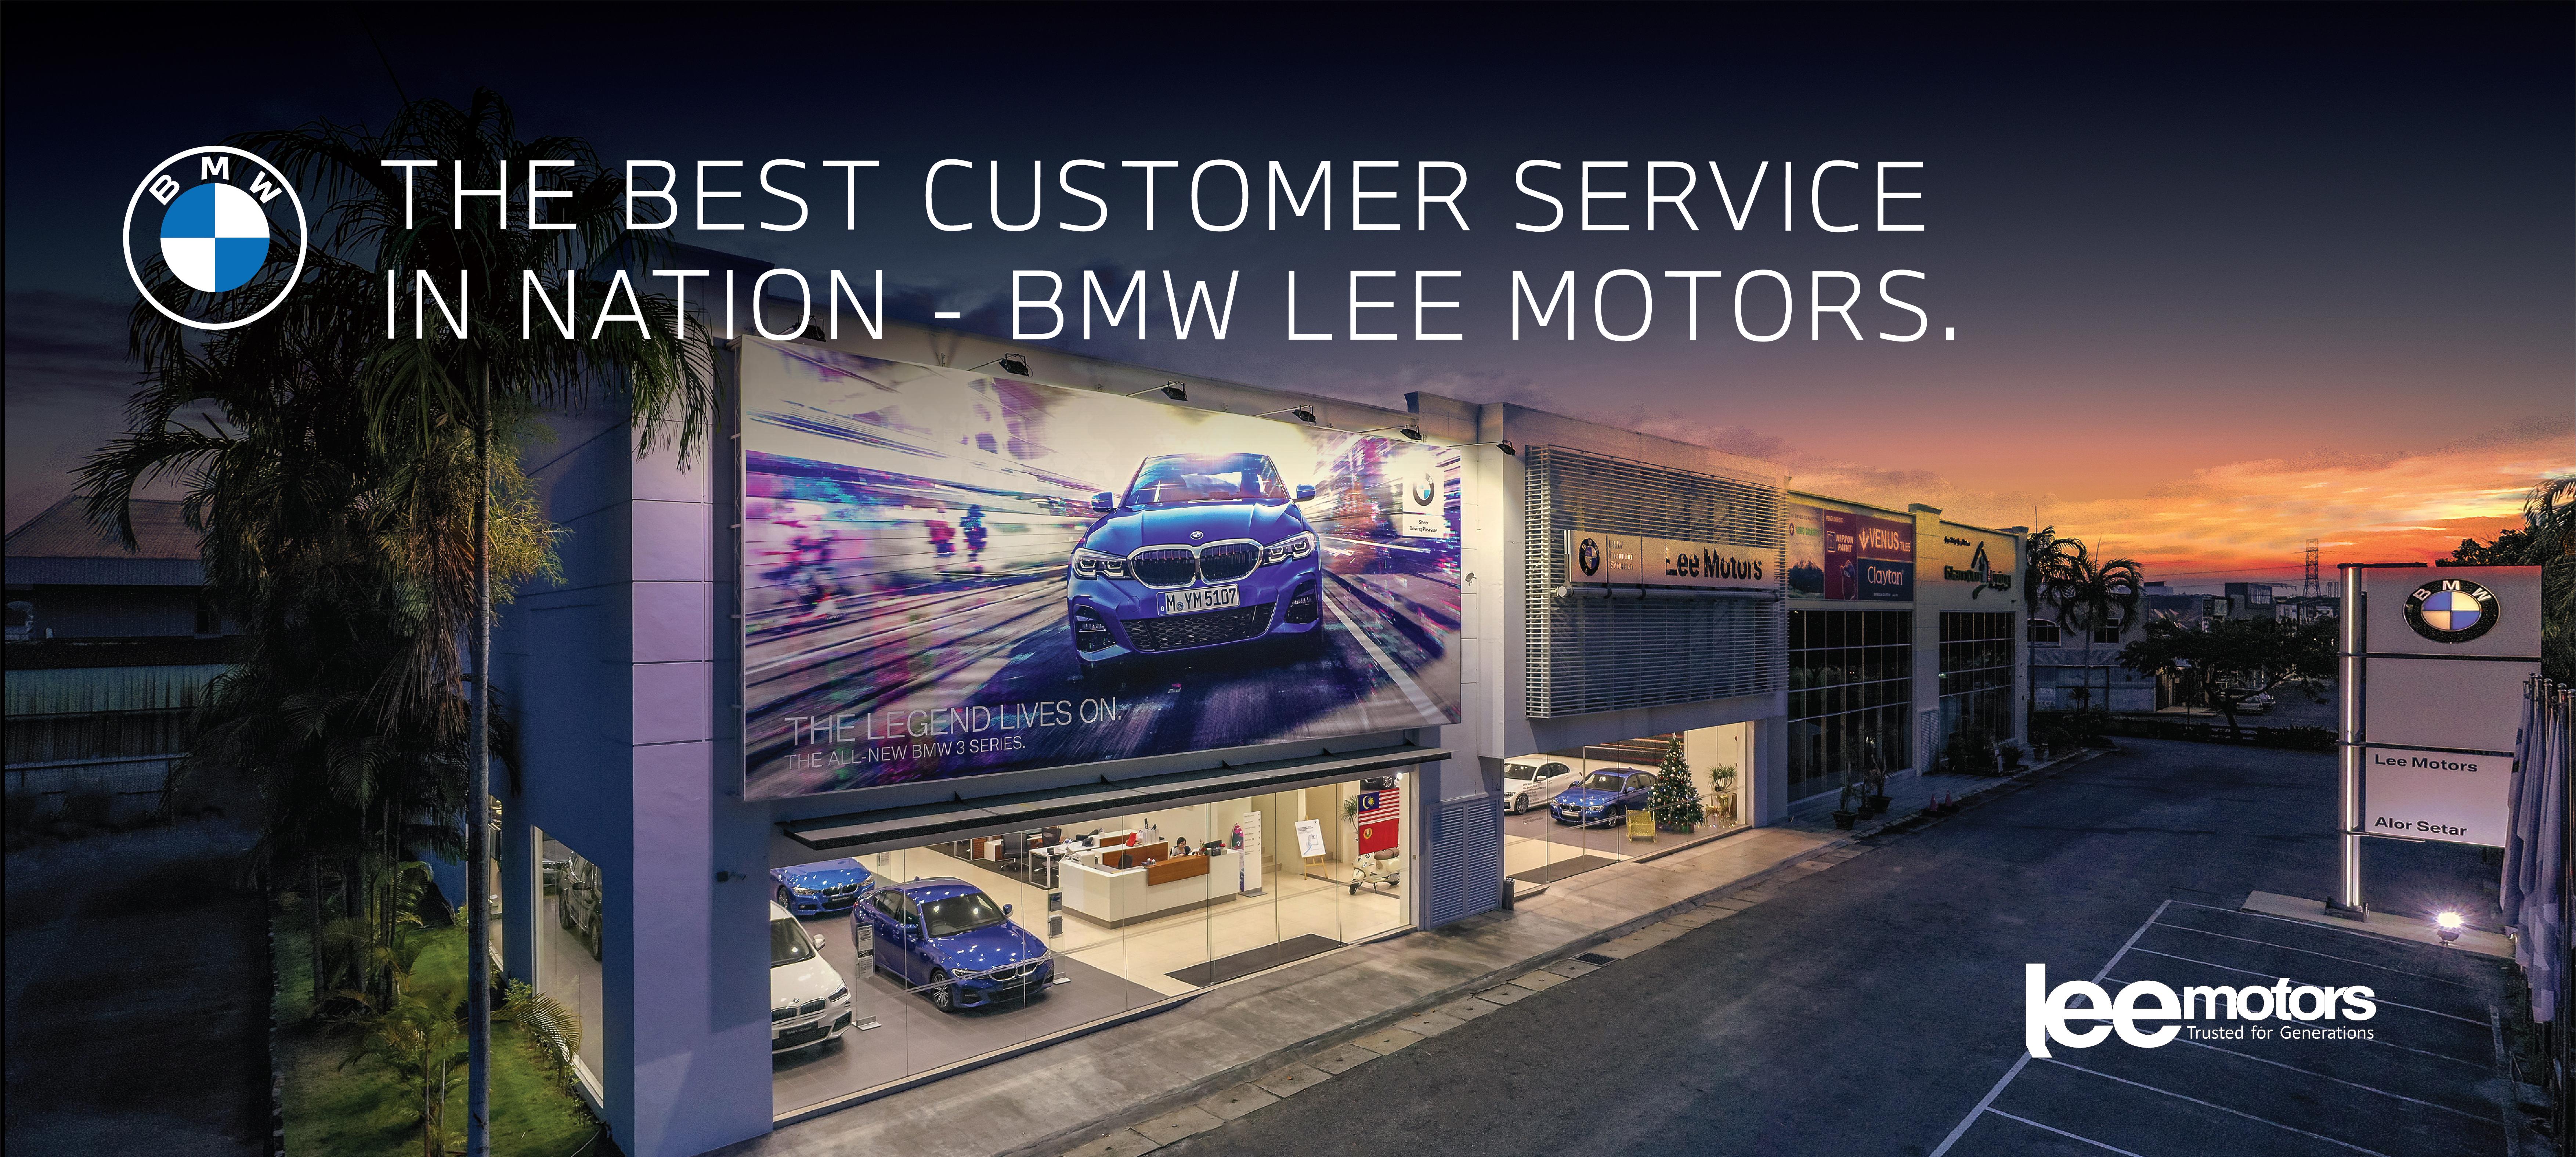 BMW Lee Motors Best Customer Service